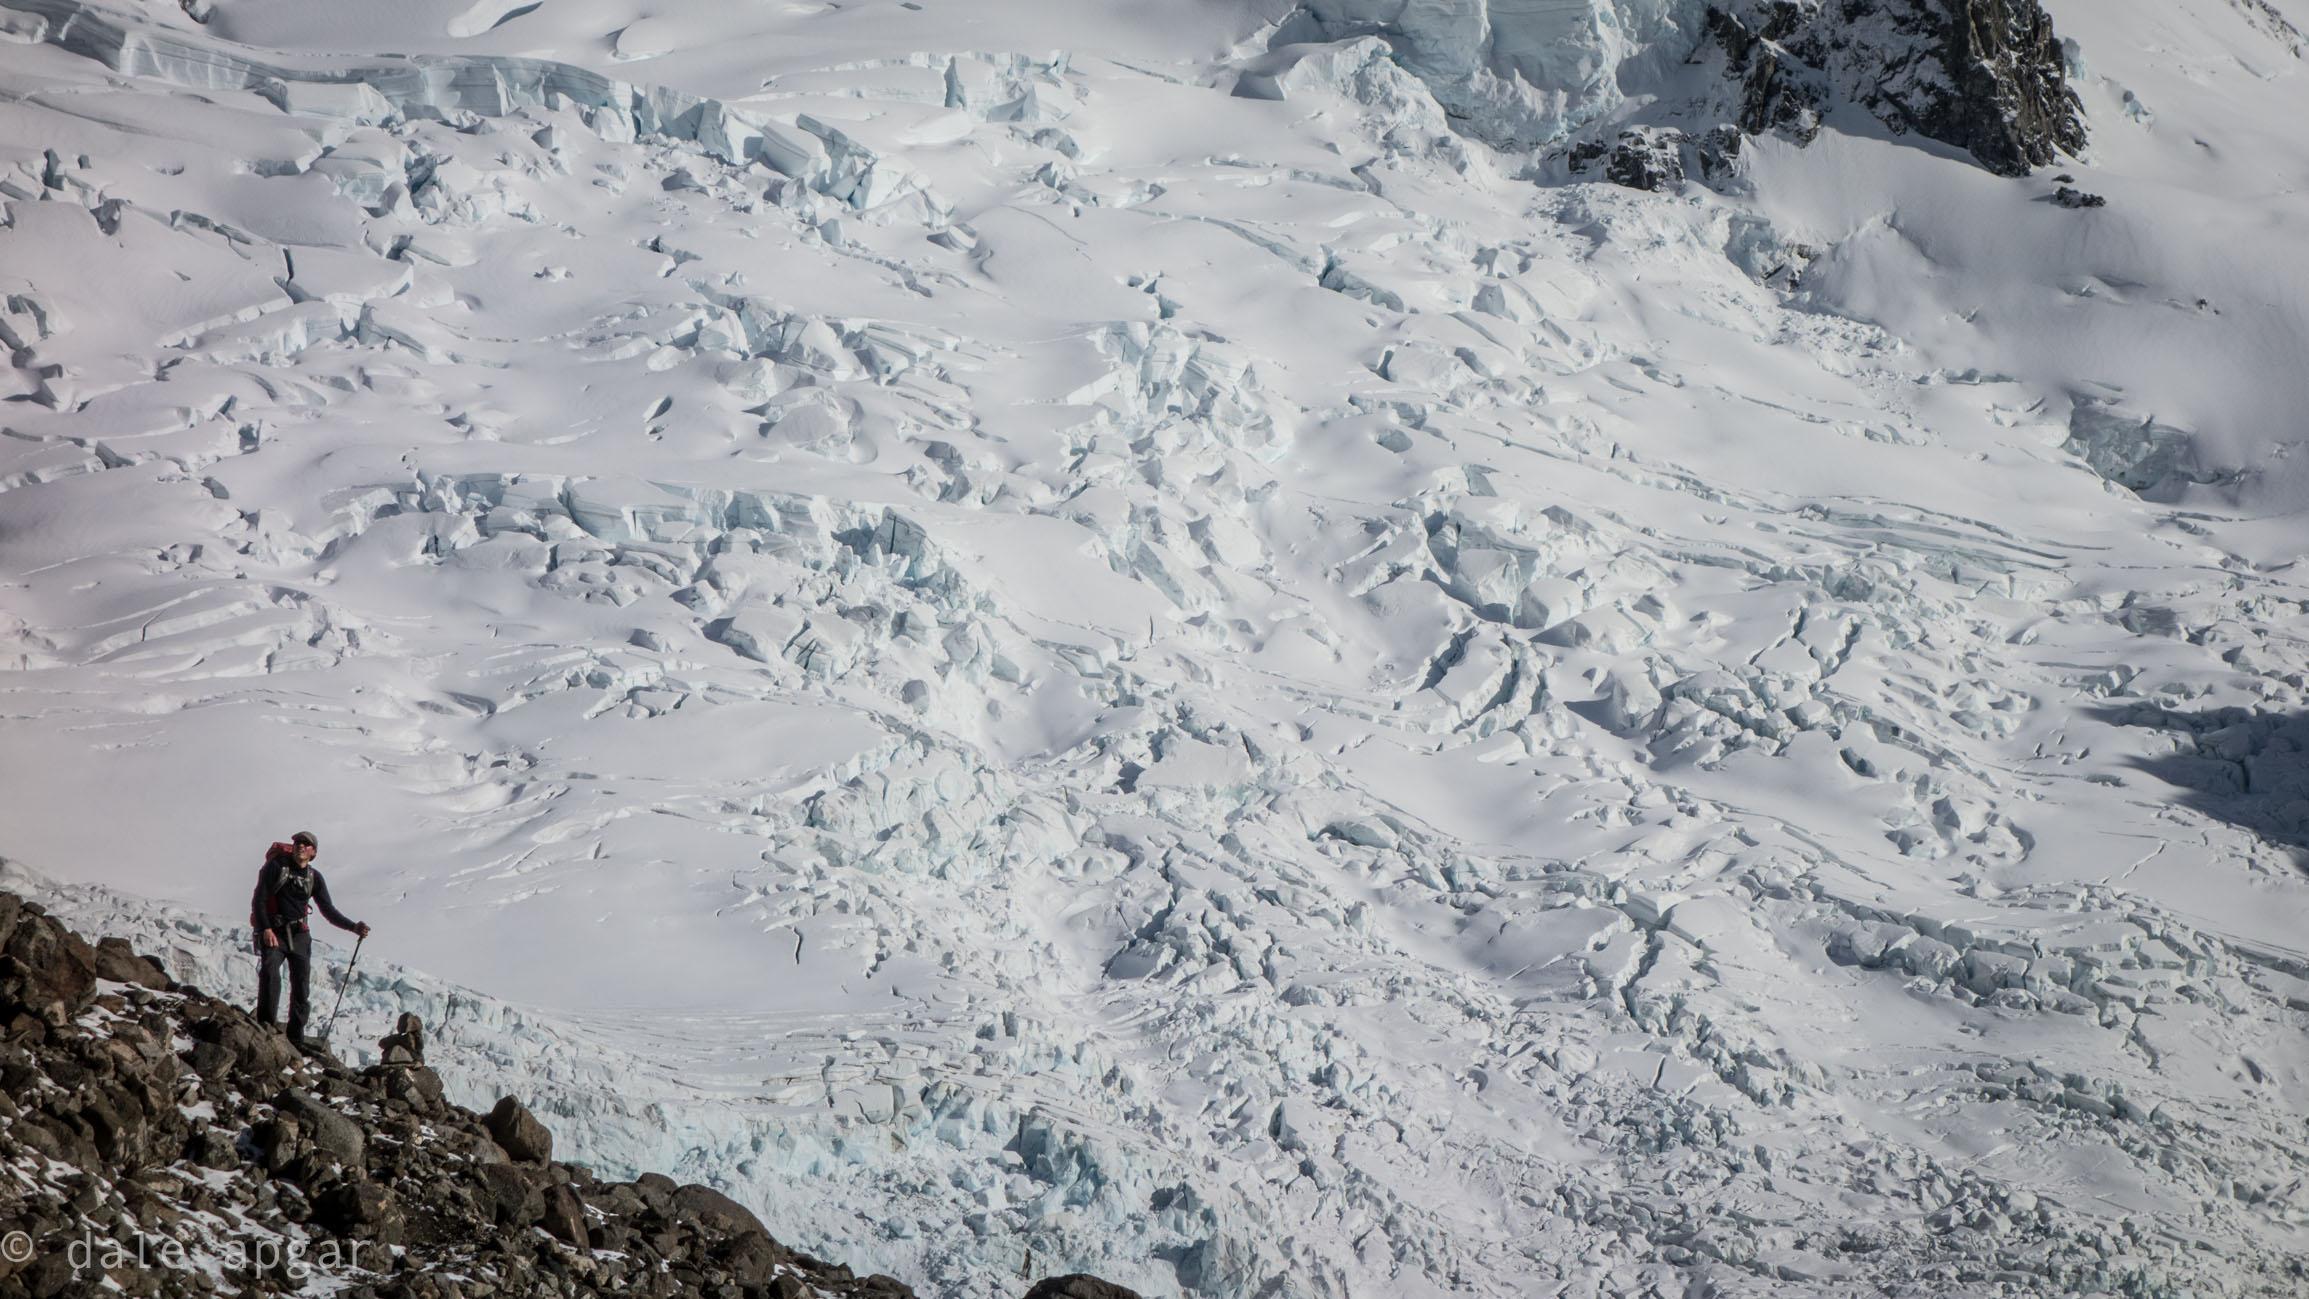 The glaciers below Poincenot